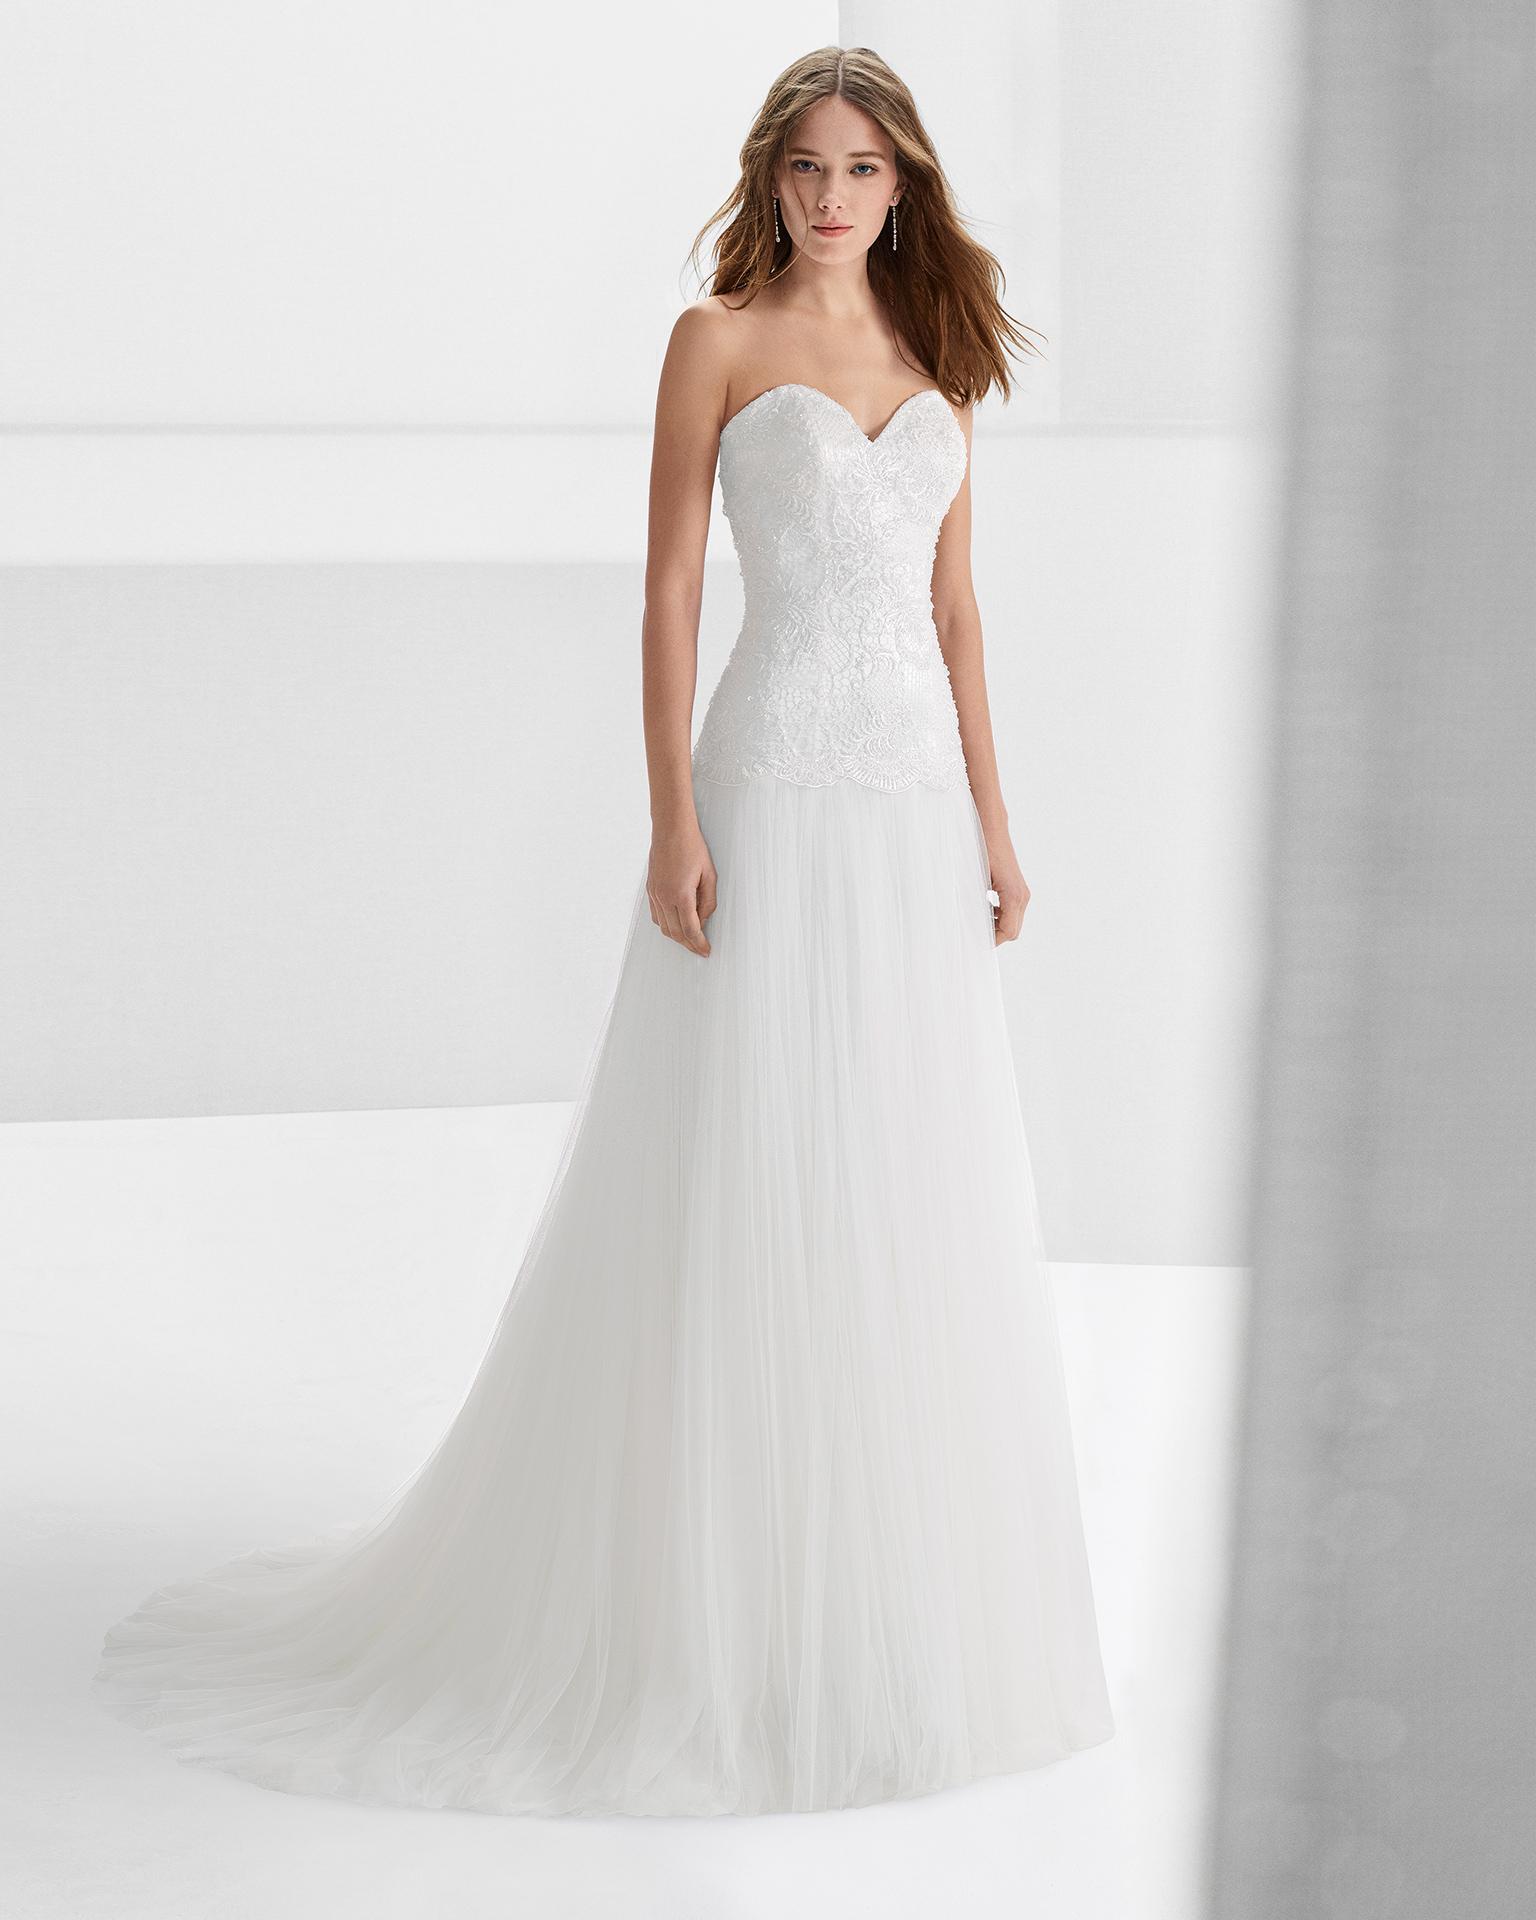 Beaded tulle sheath wedding dress with sweetheart neckline.